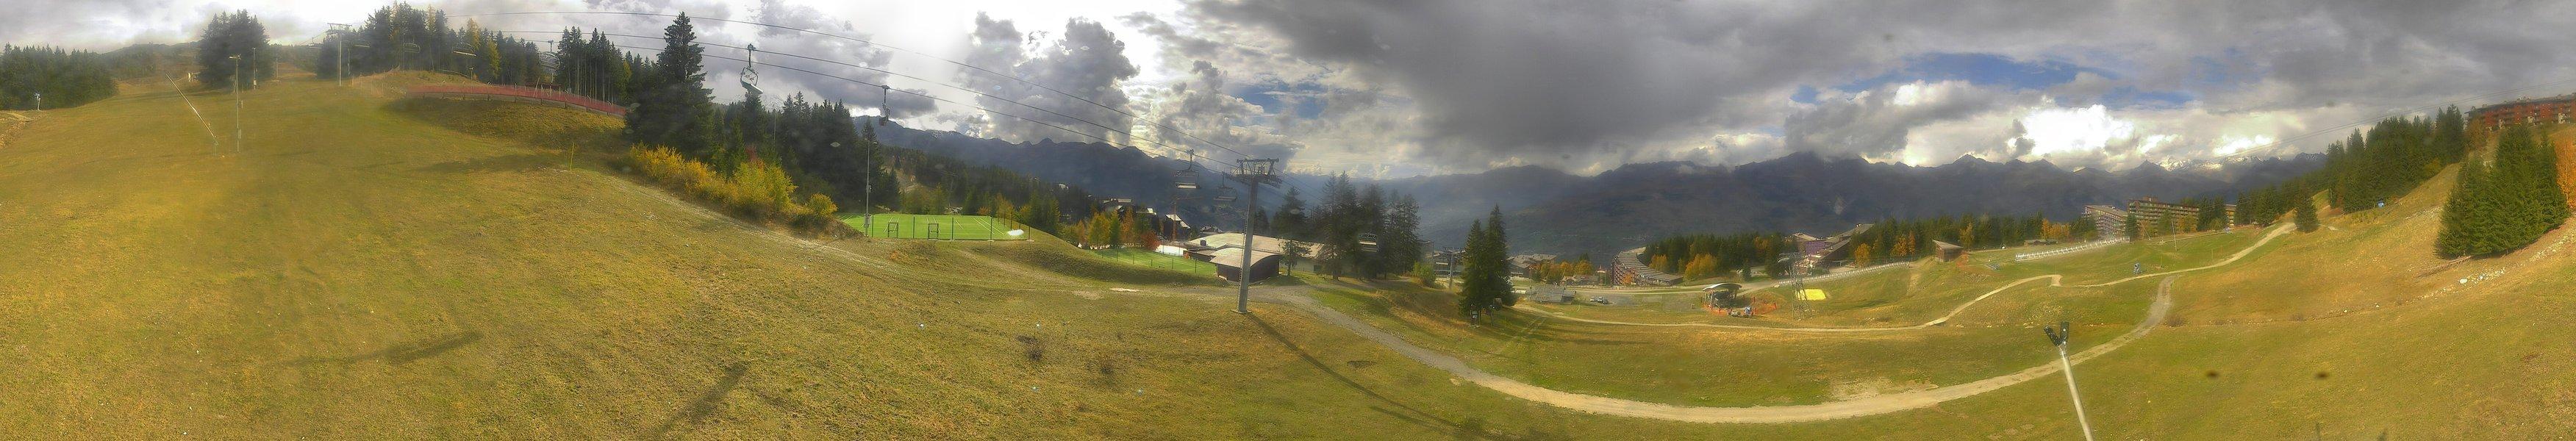 Webcam - Slalom